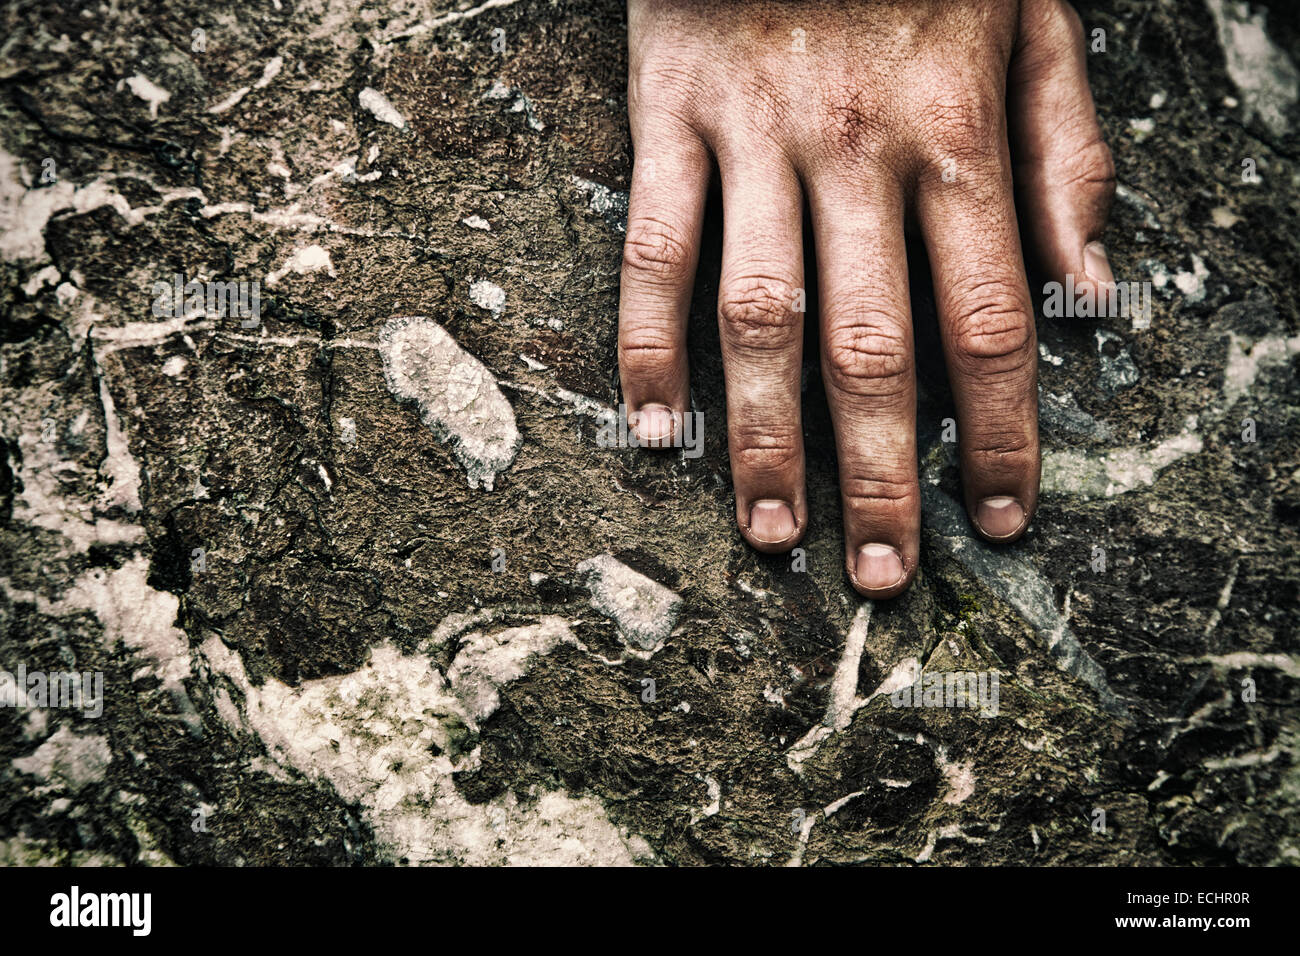 Single hand on craggy rock - Stock Image